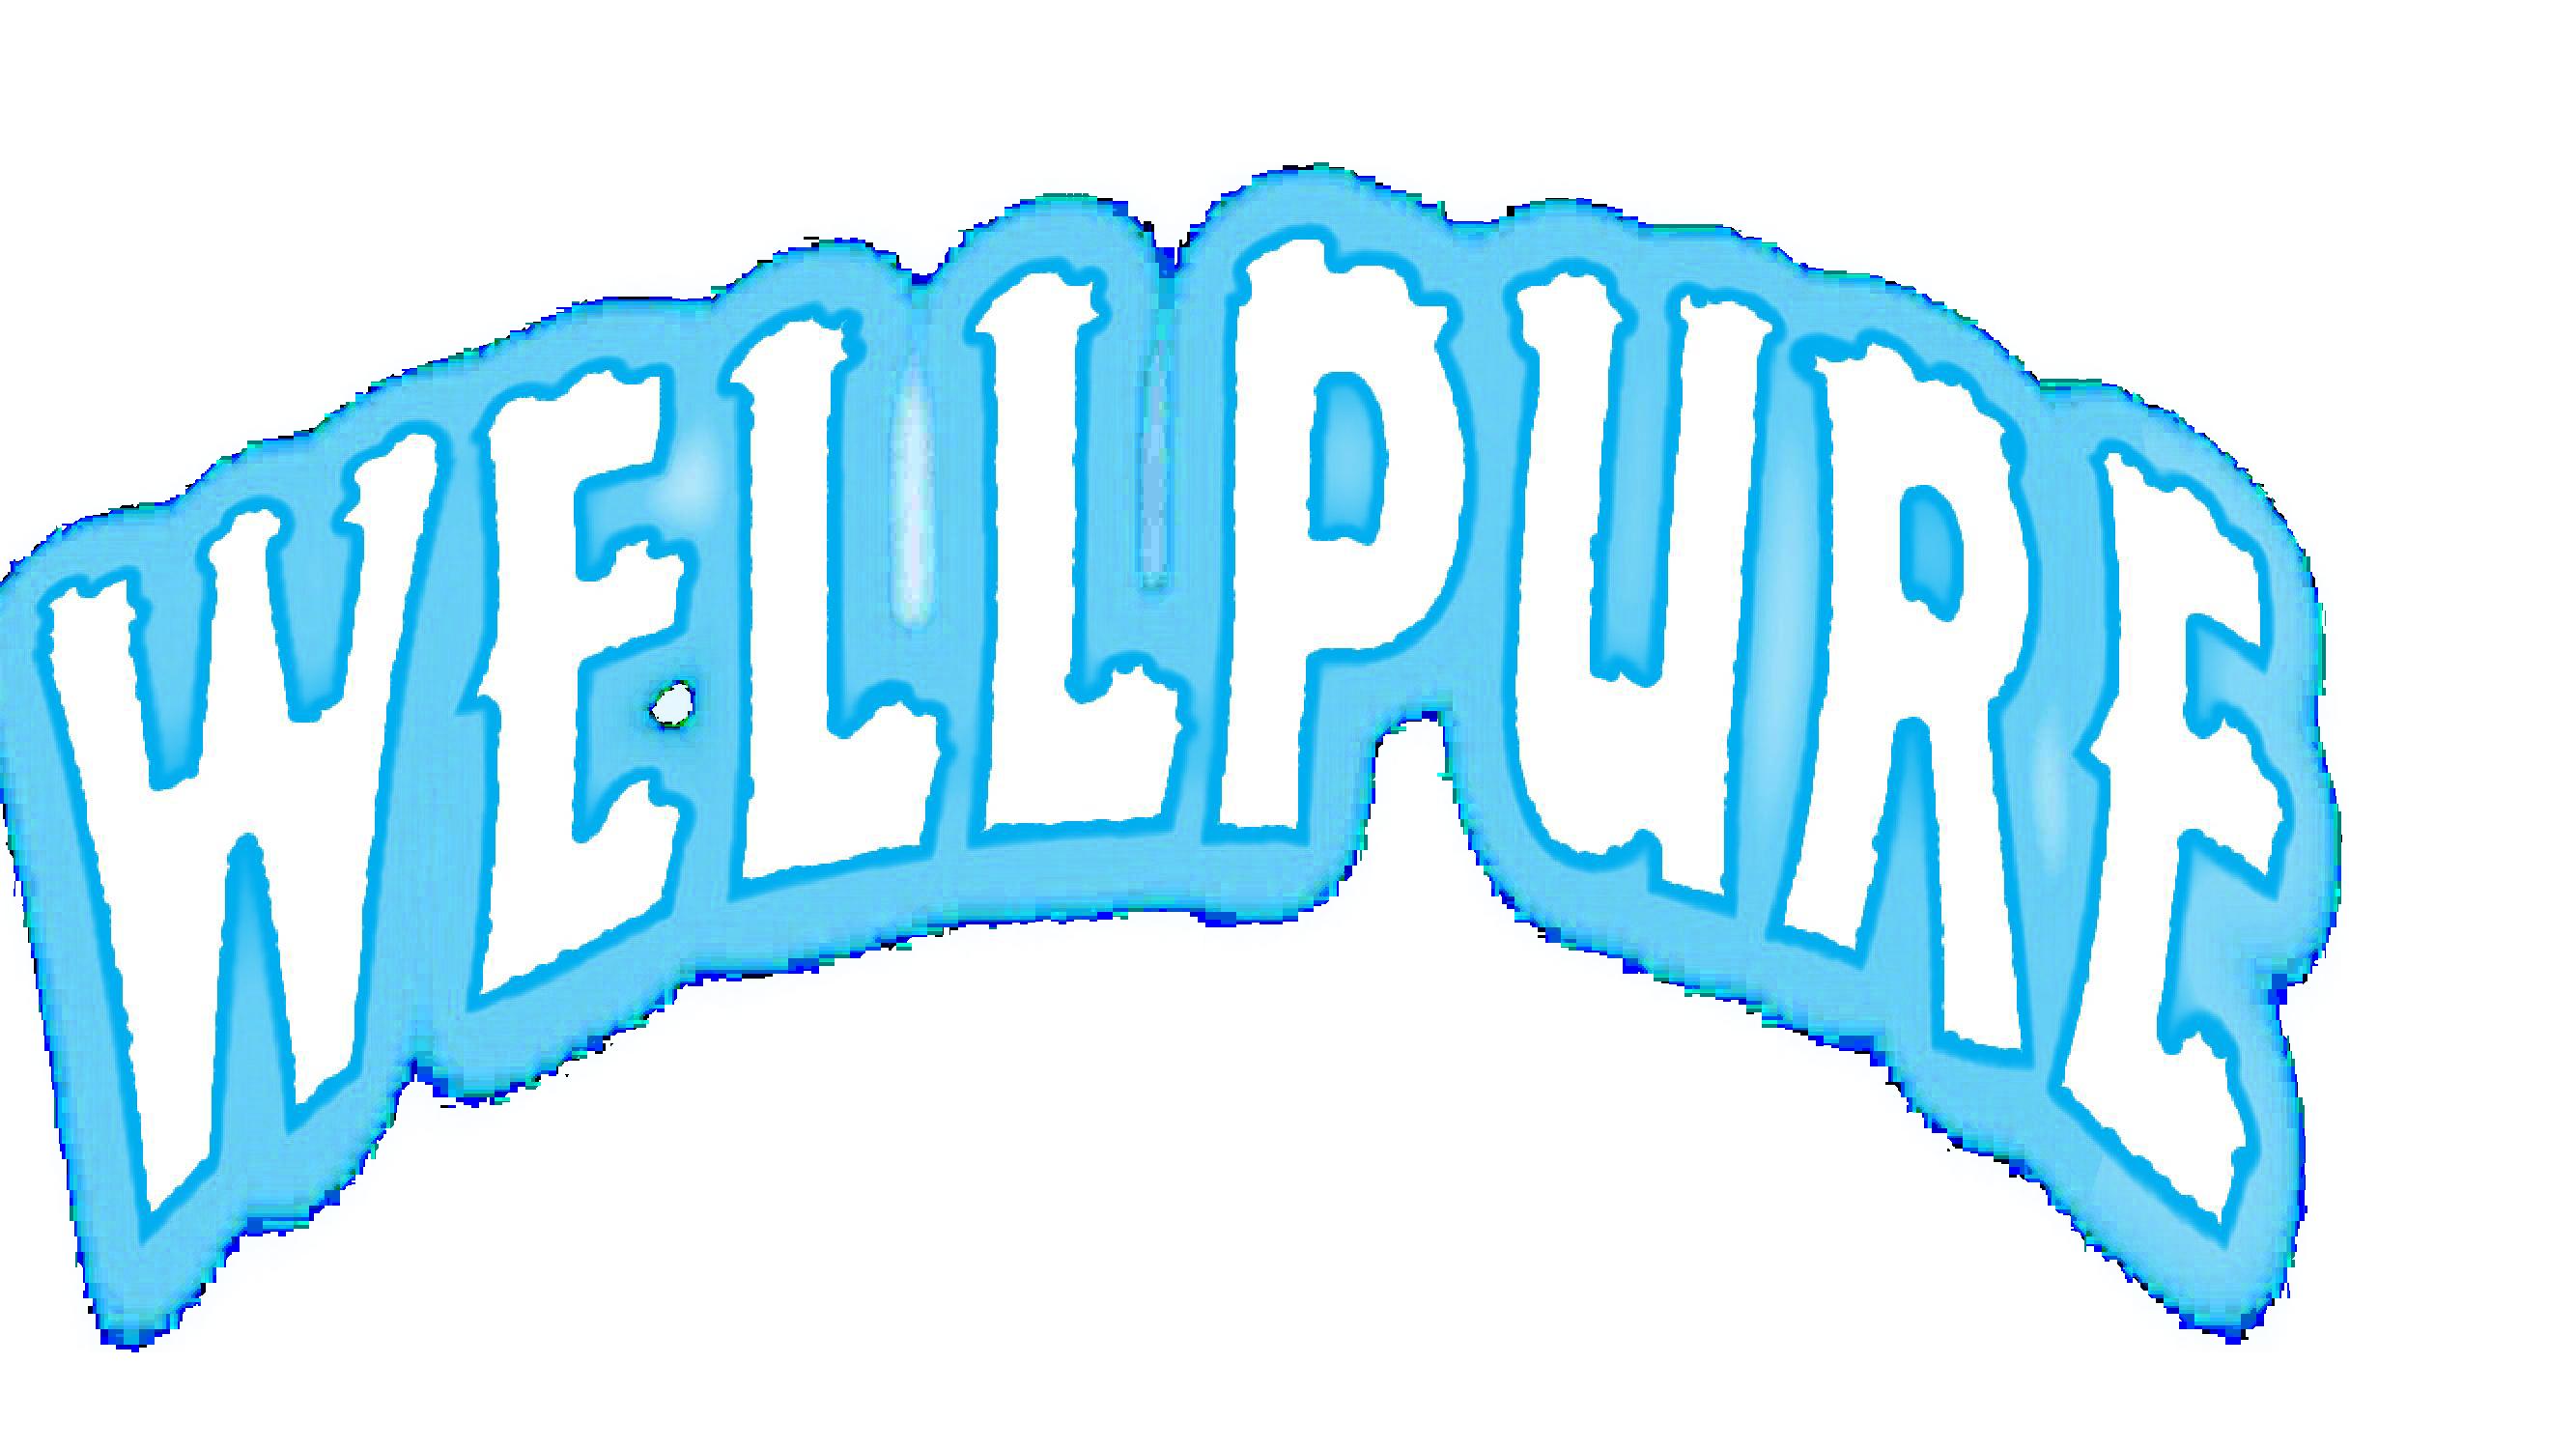 Wellpure